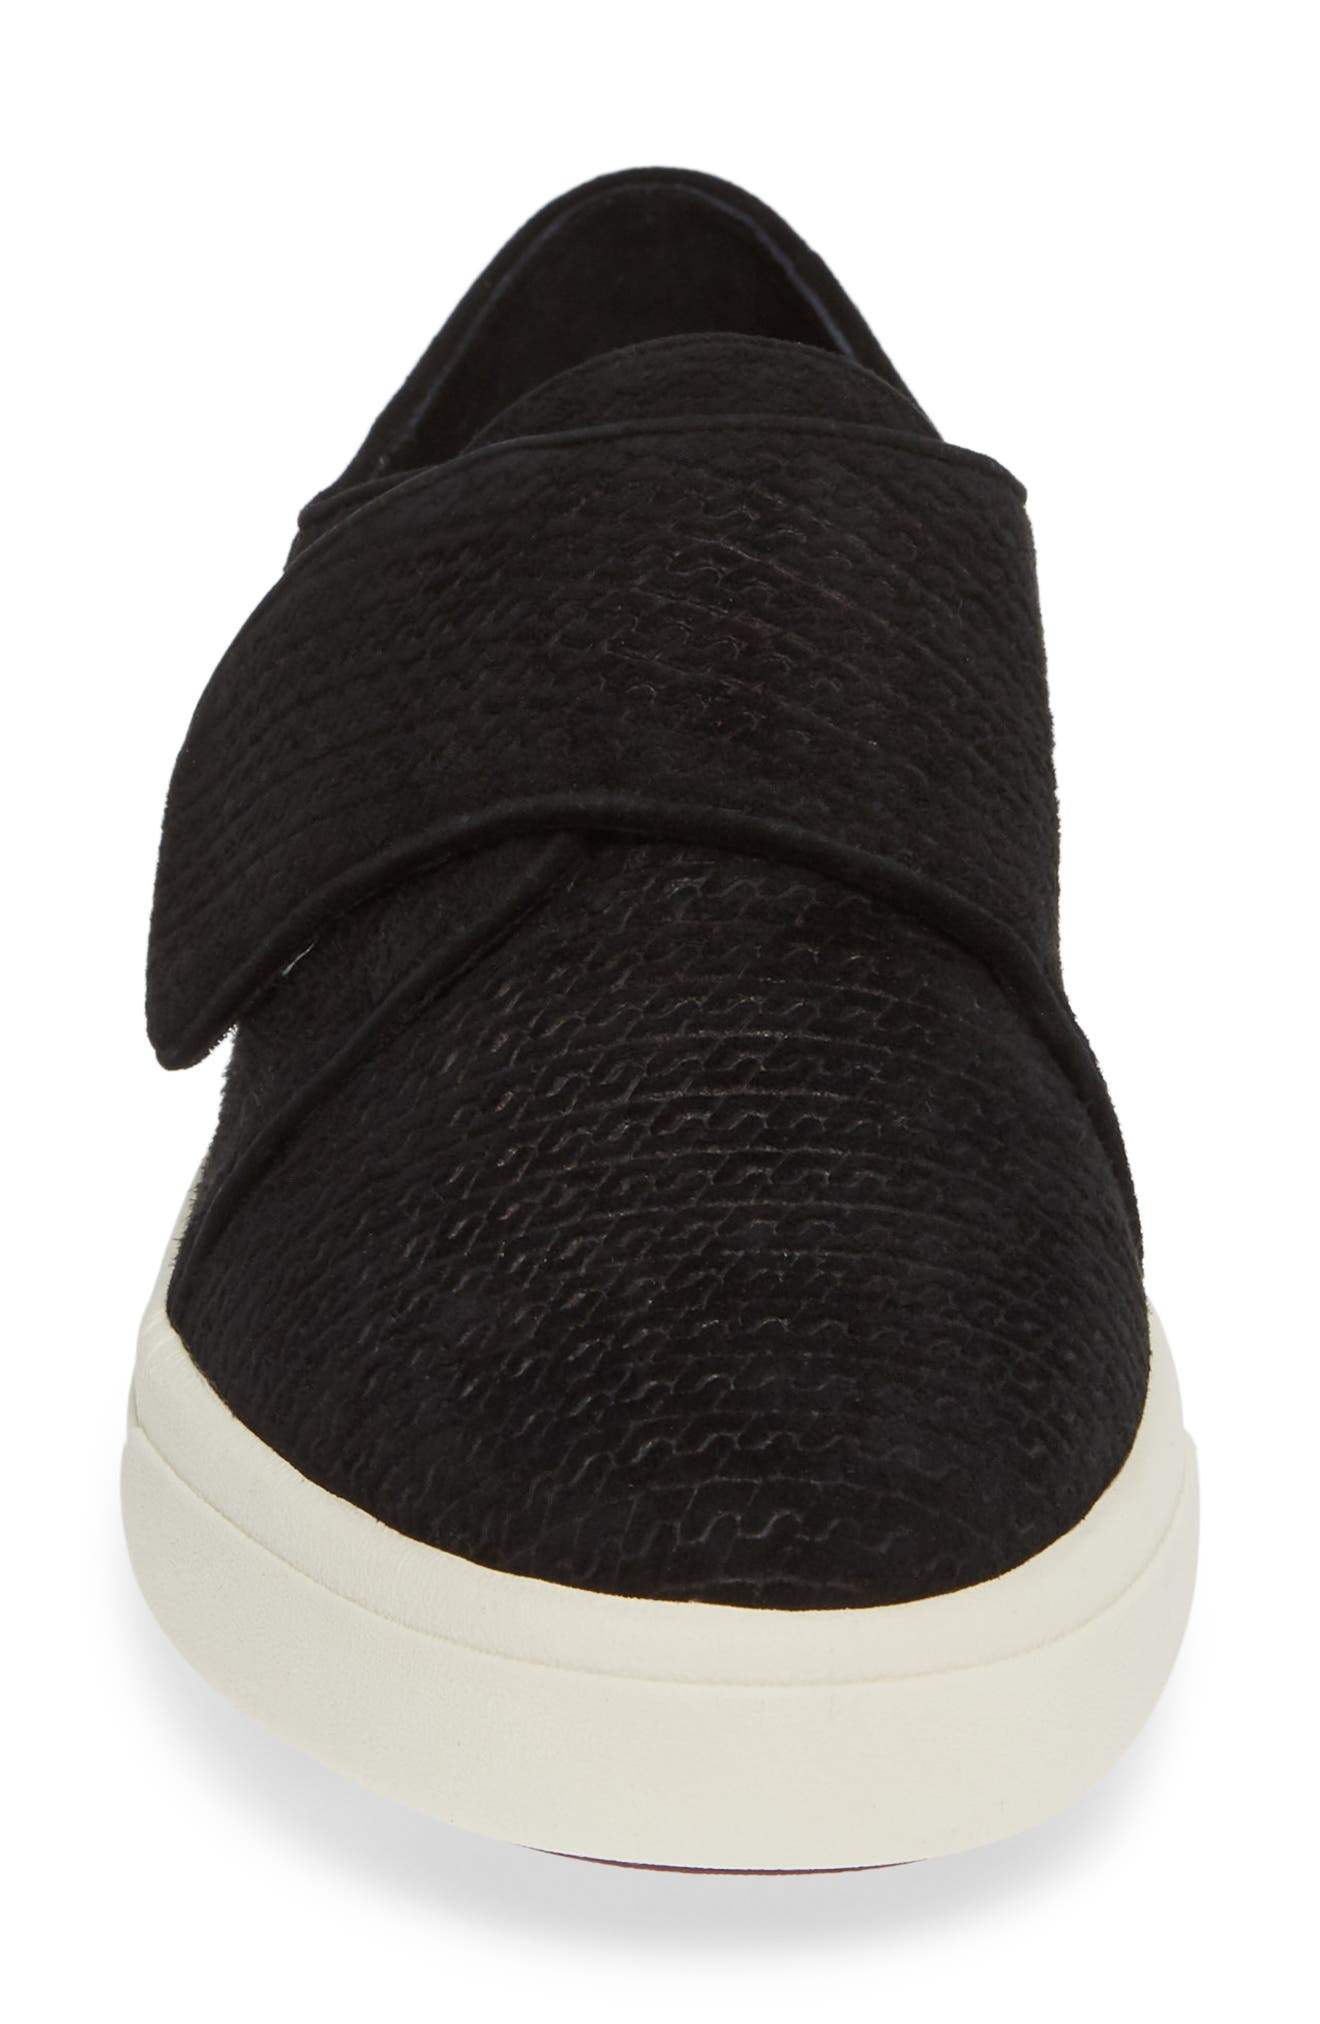 VANELI,                             Oberon Slip-On Sneaker,                             Alternate thumbnail 4, color,                             BLACK SUEDE